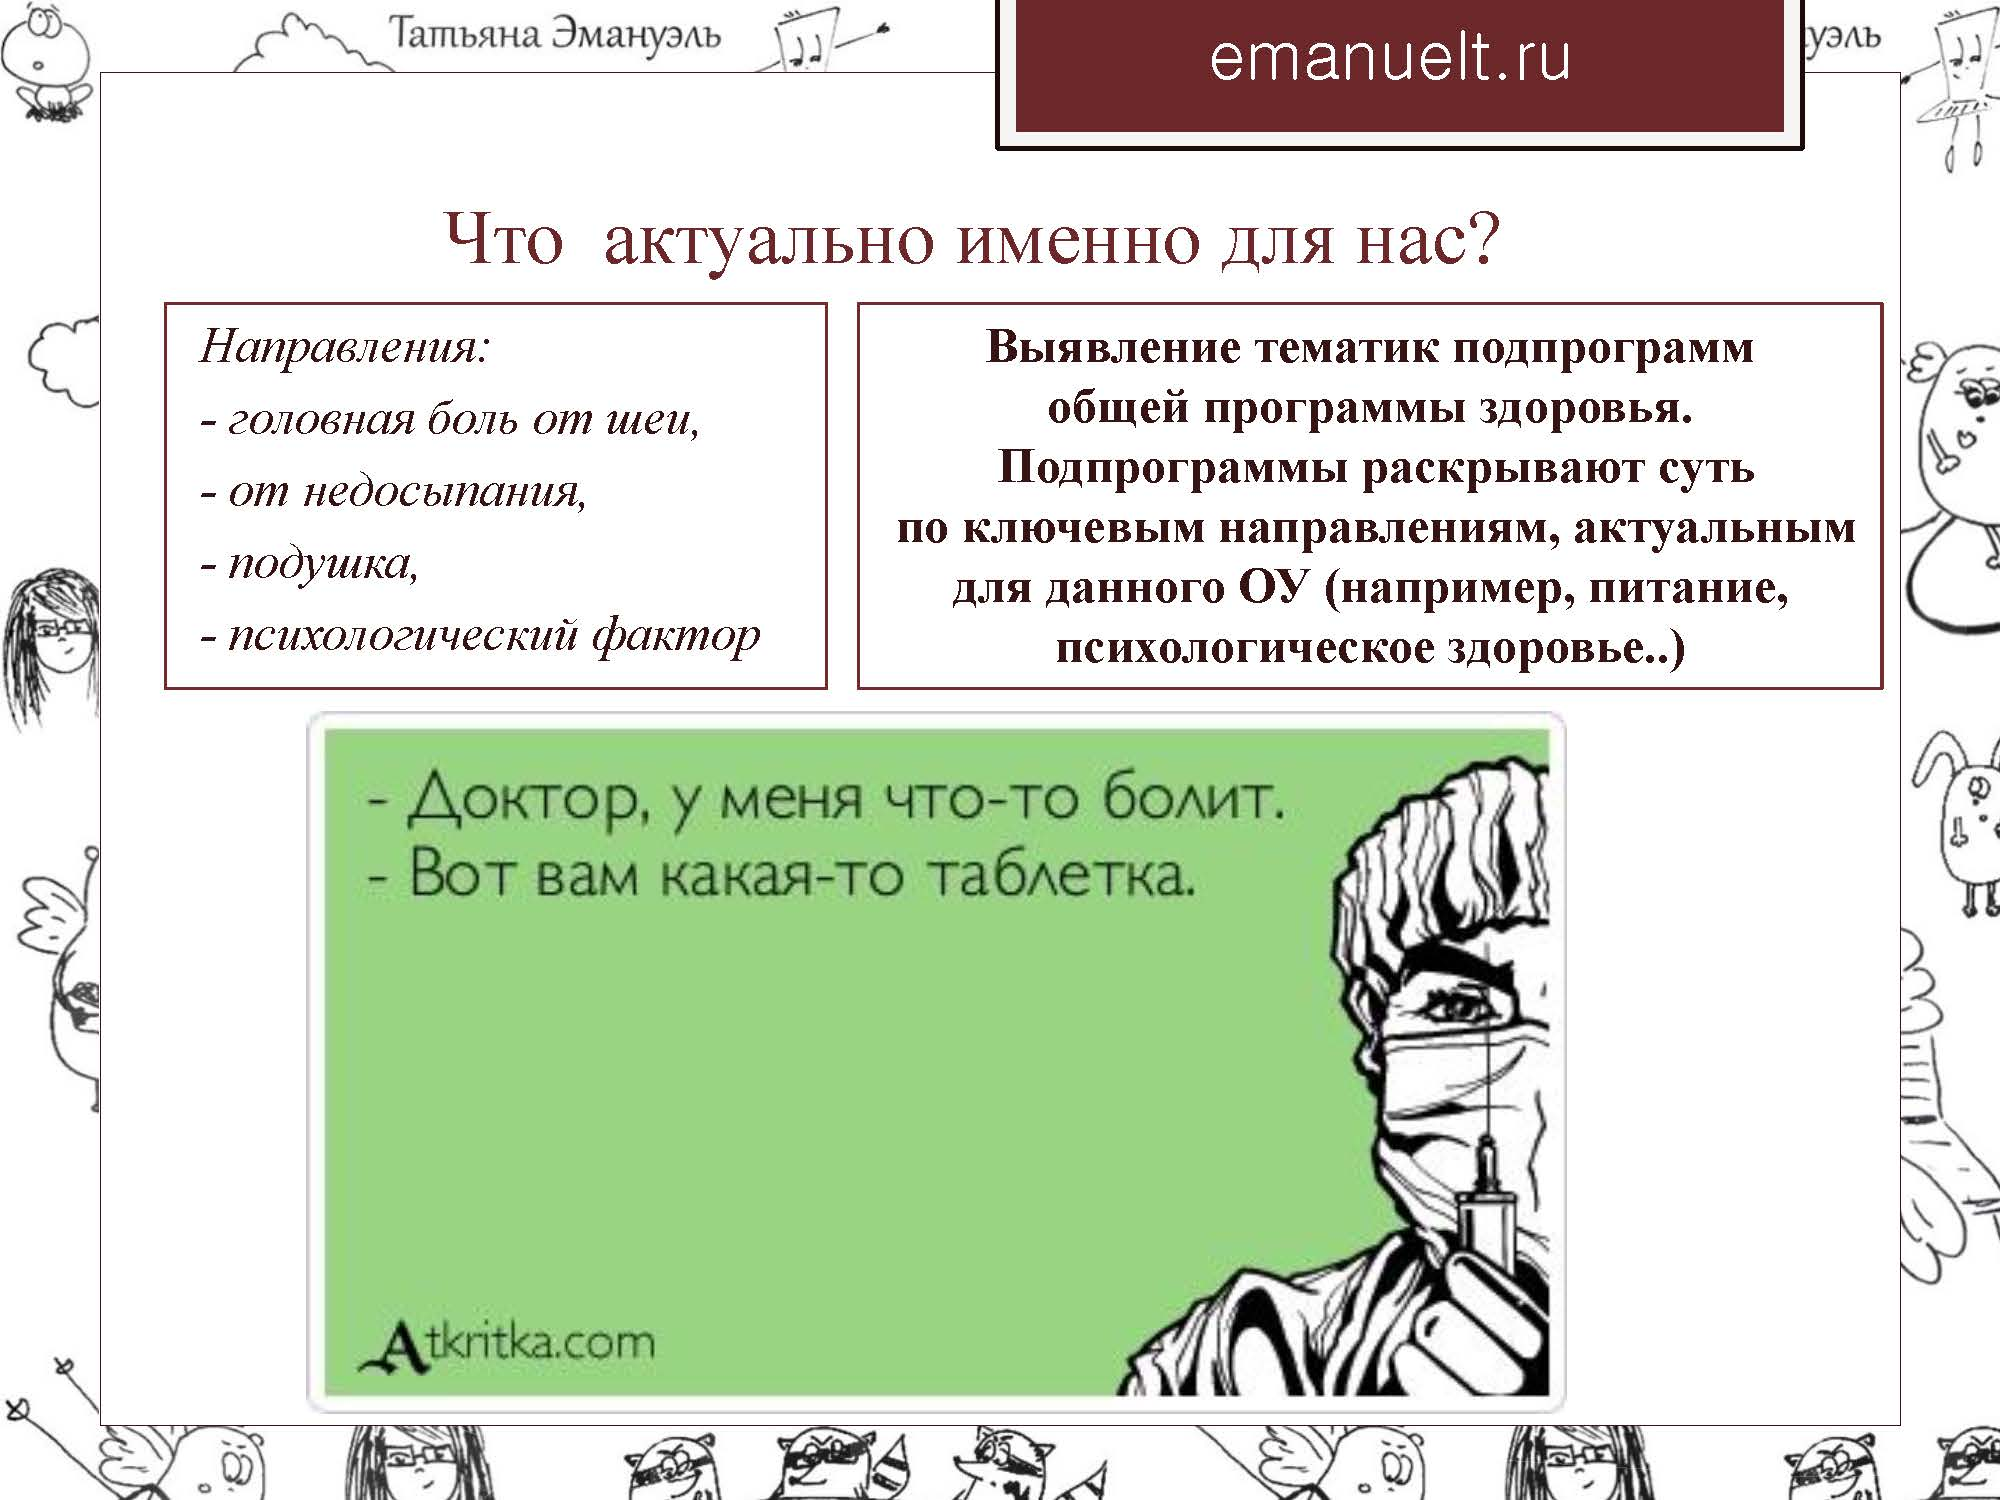 06 февраля эмануэль_Страница_022